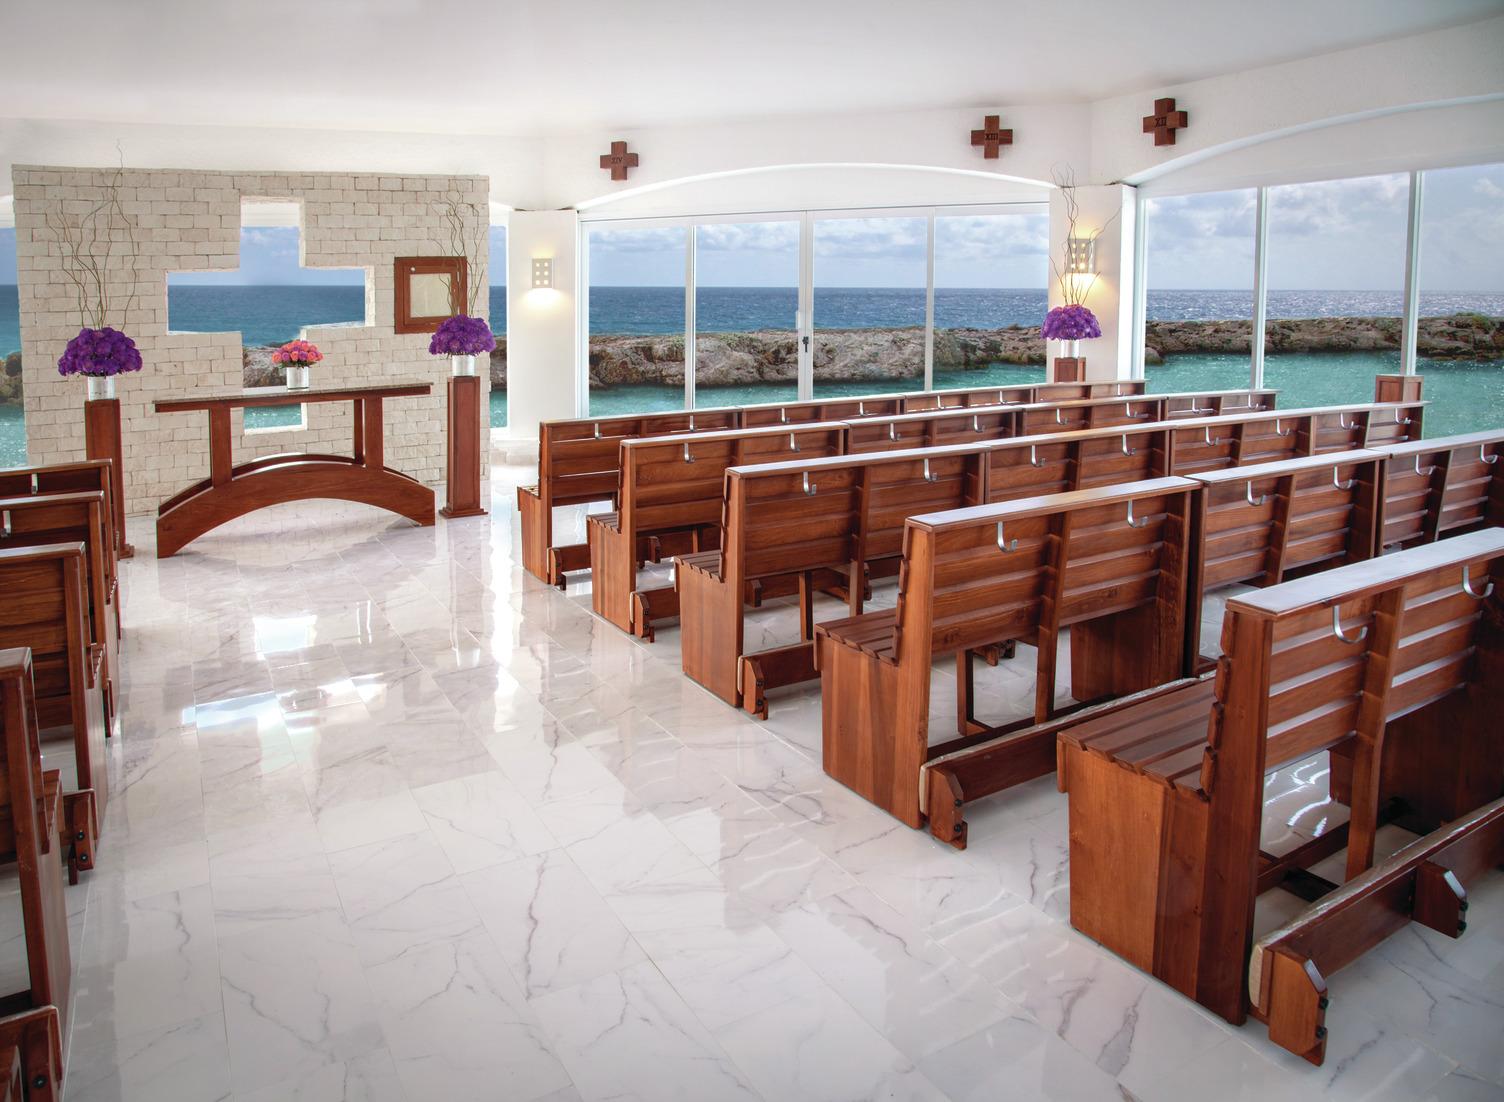 Travel Agency All-Inclusive Resort Heaven at Hard Rock Hotel Riviera Maya 66